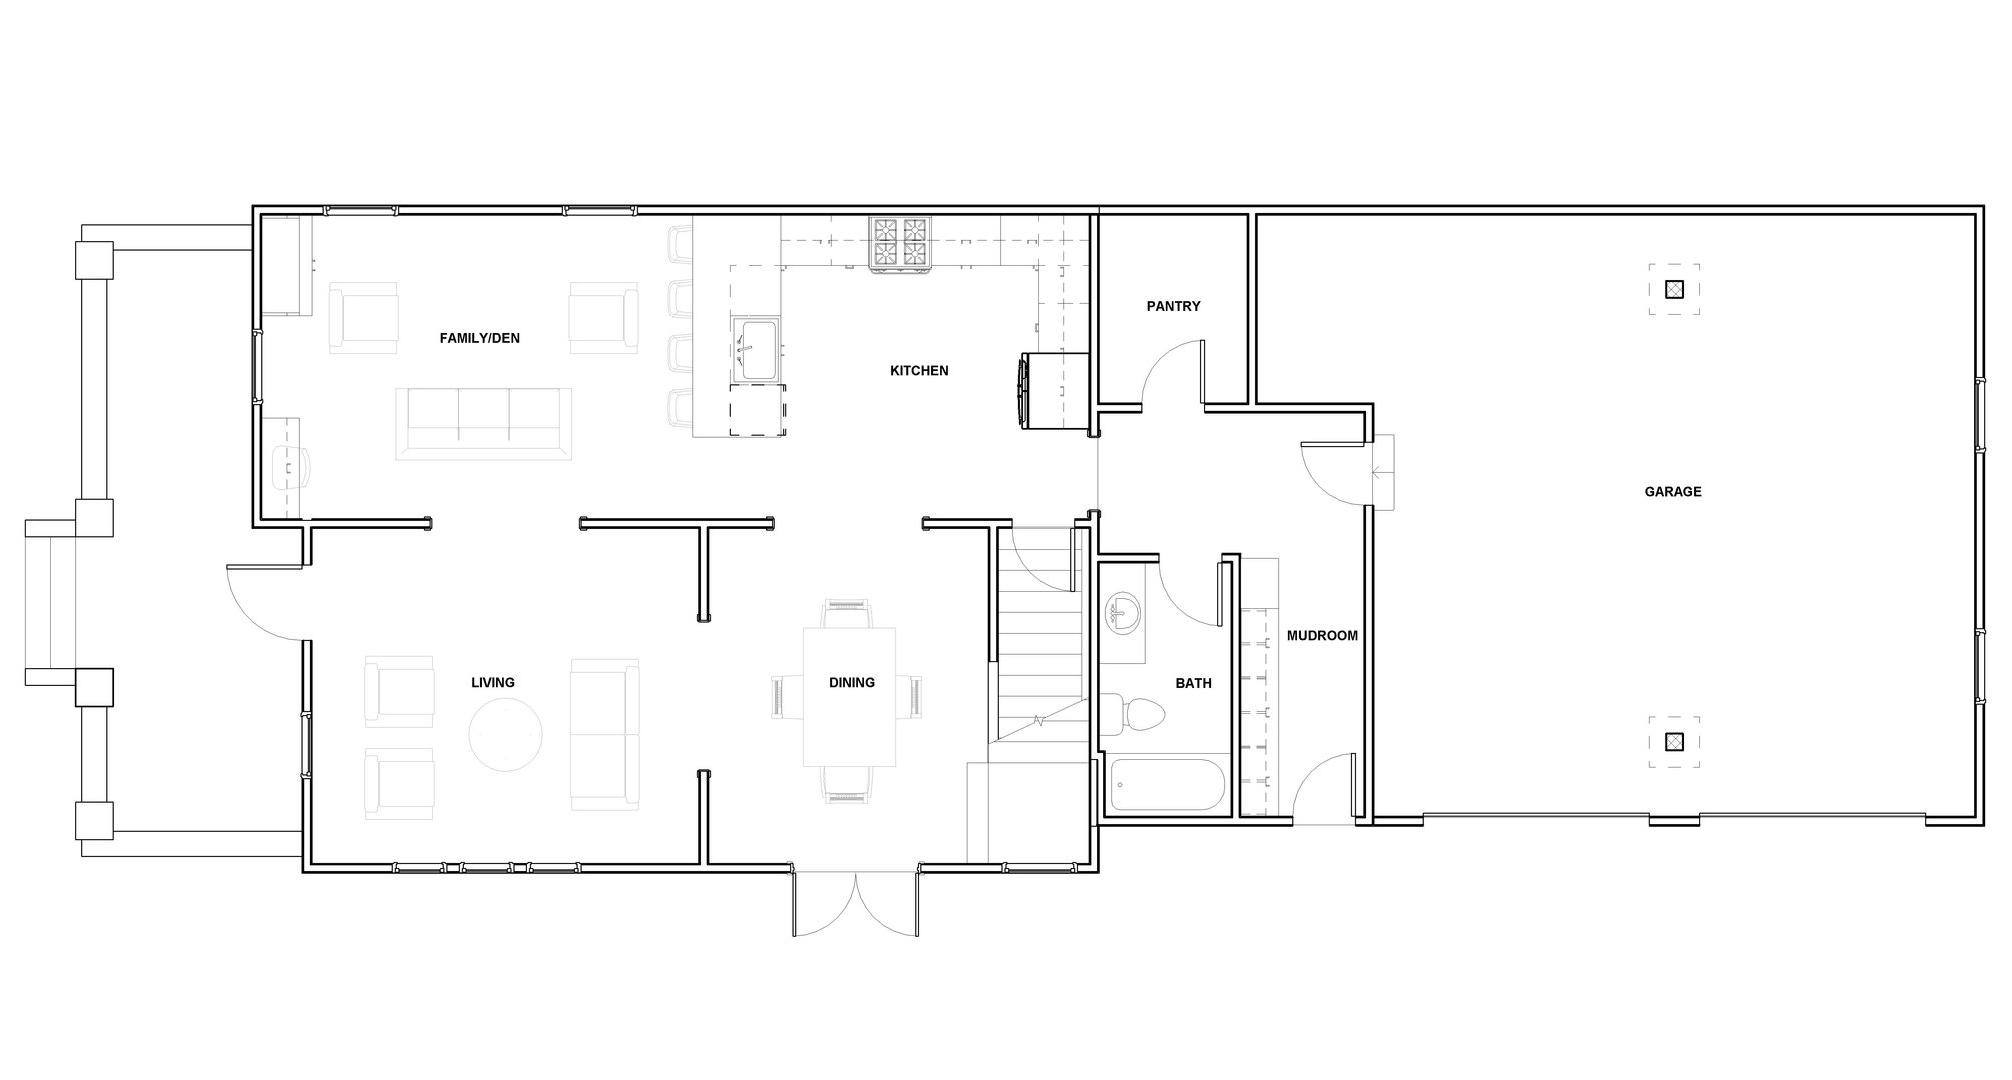 3839 Park - First Floor Plan.jpg